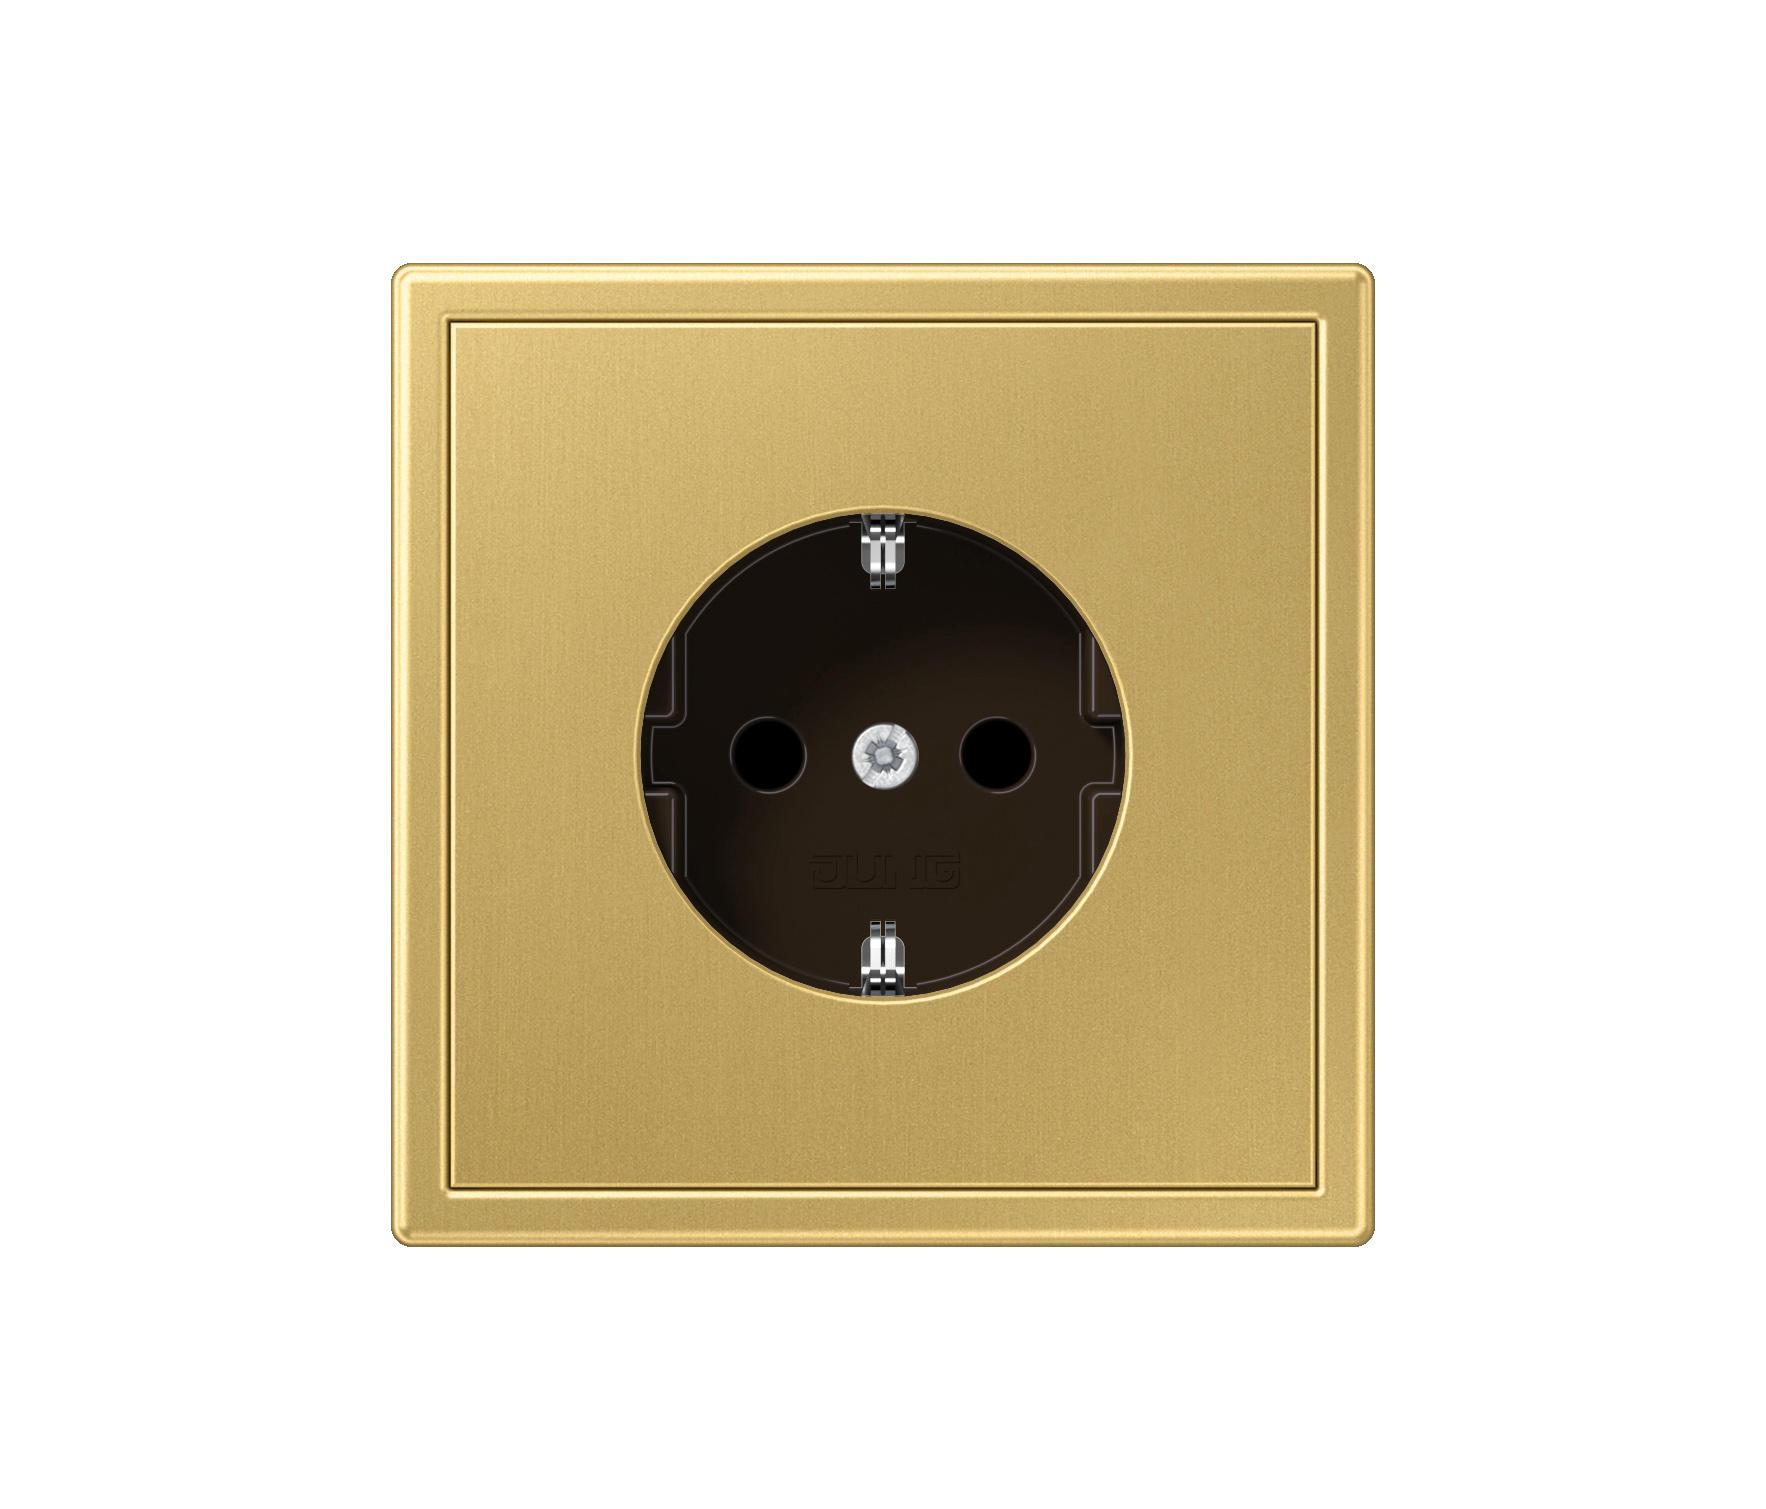 ls 990 messing classic steckdose schuko stecker von jung. Black Bedroom Furniture Sets. Home Design Ideas